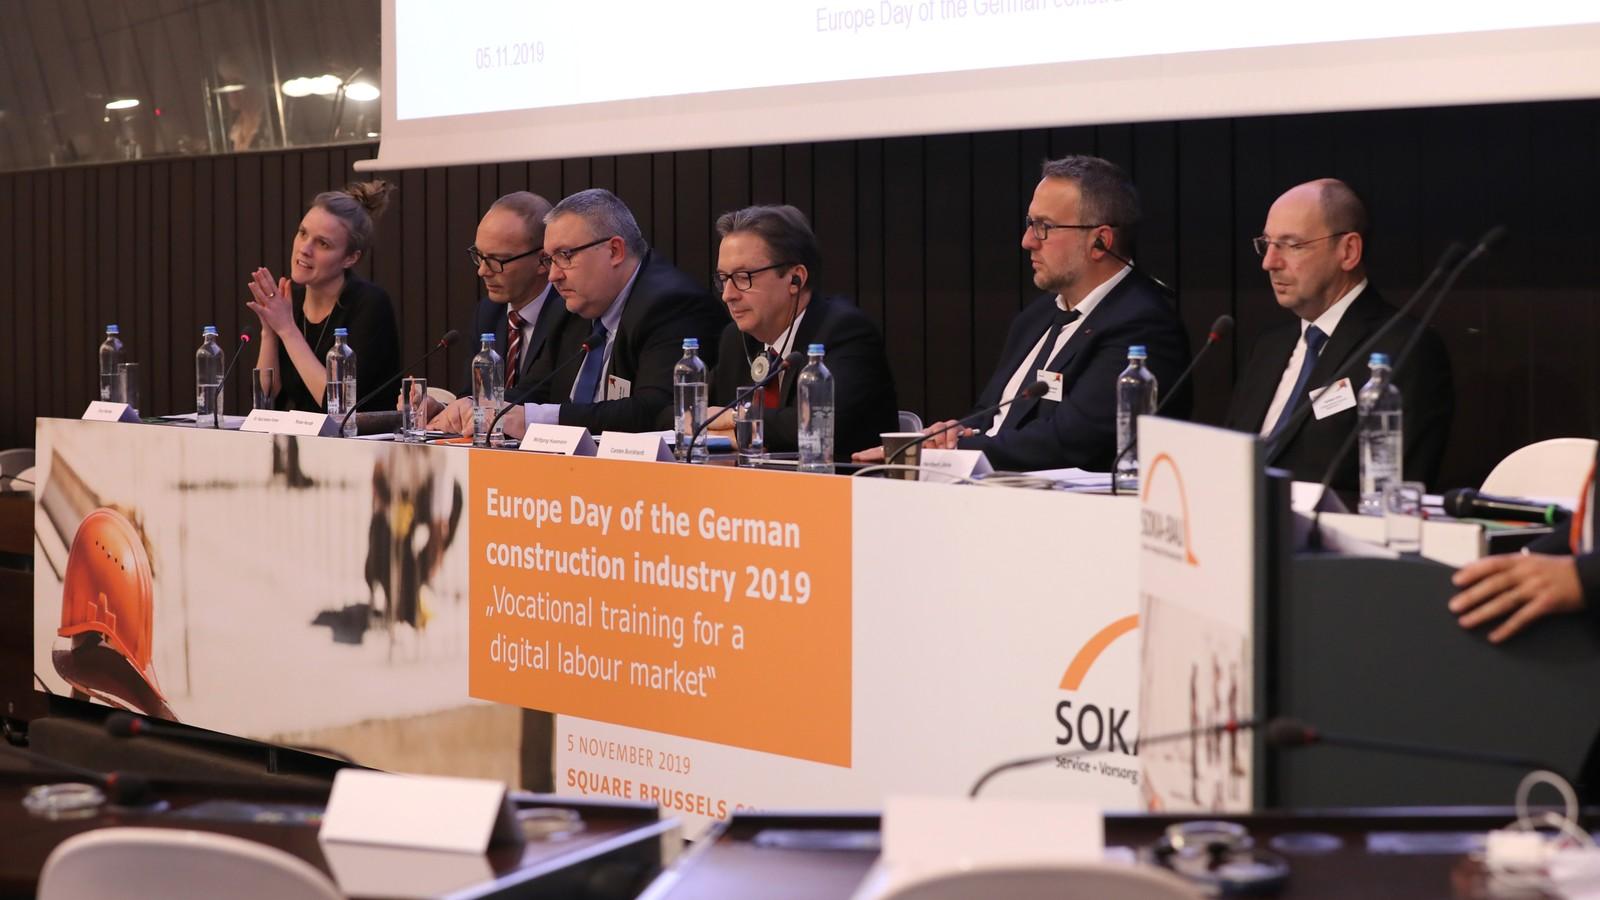 Teilnehmer der Podiumsdiskussion, v.l.n.r. Terry Reintke, MEP, Dr. Pauli Antero Forma, Roman Horvath, Wolfgang Husemann, Carsten Burckhardt, Heribert Jöris.